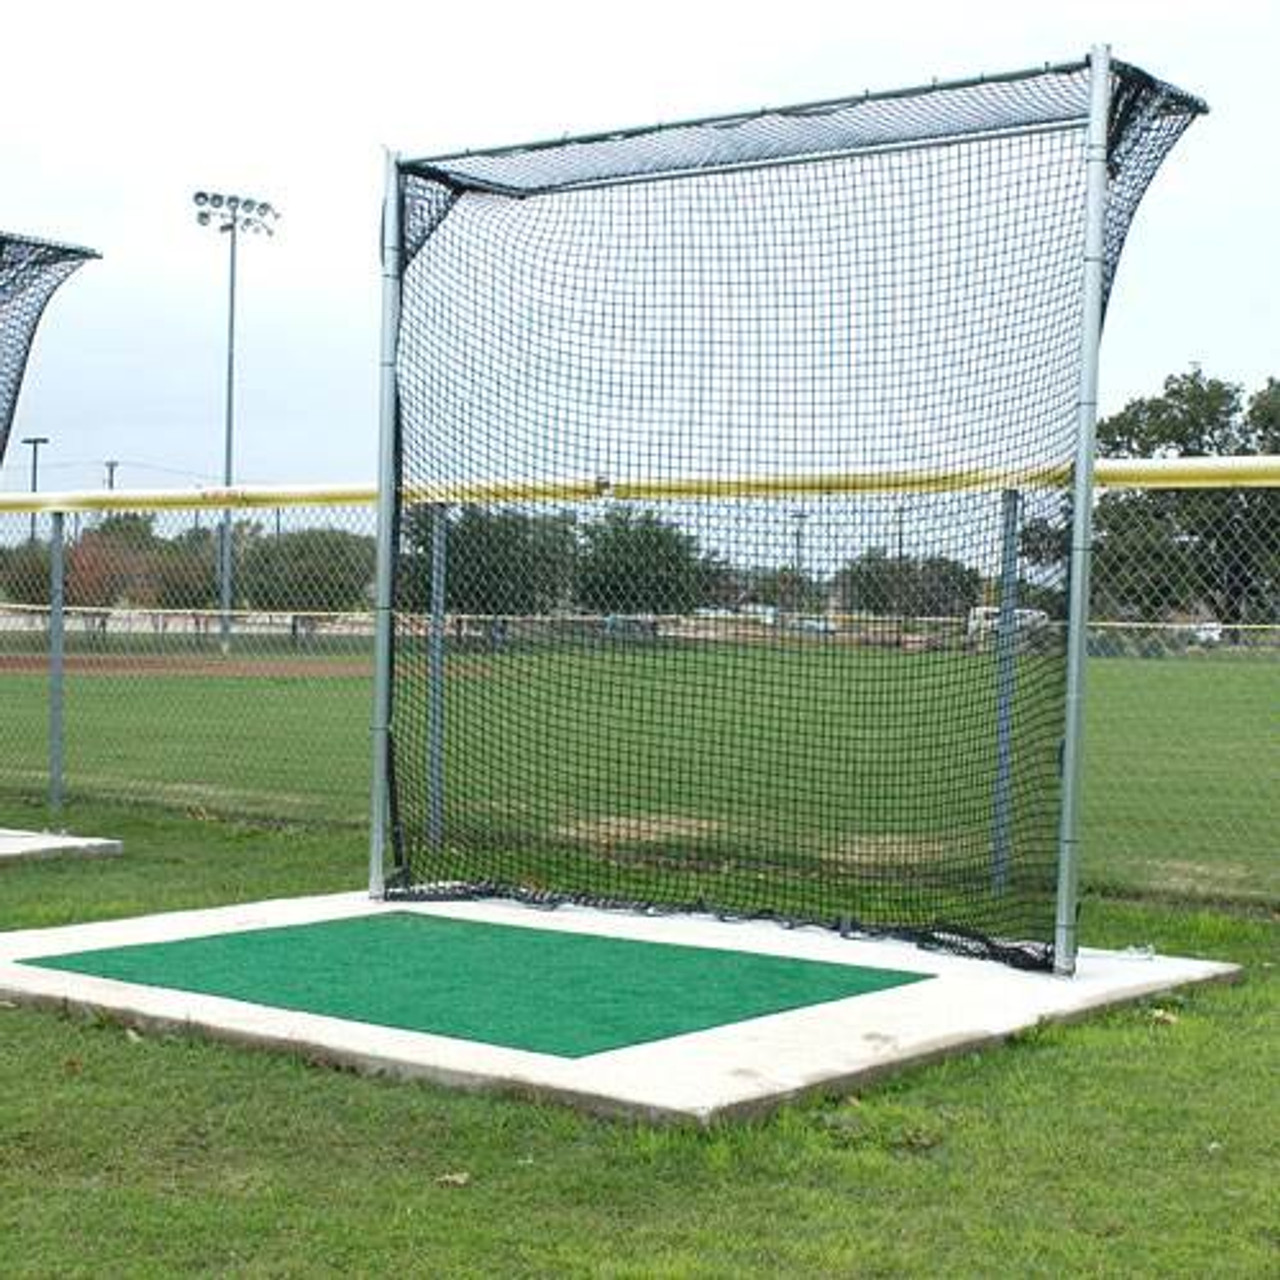 Baseball Hitting Station